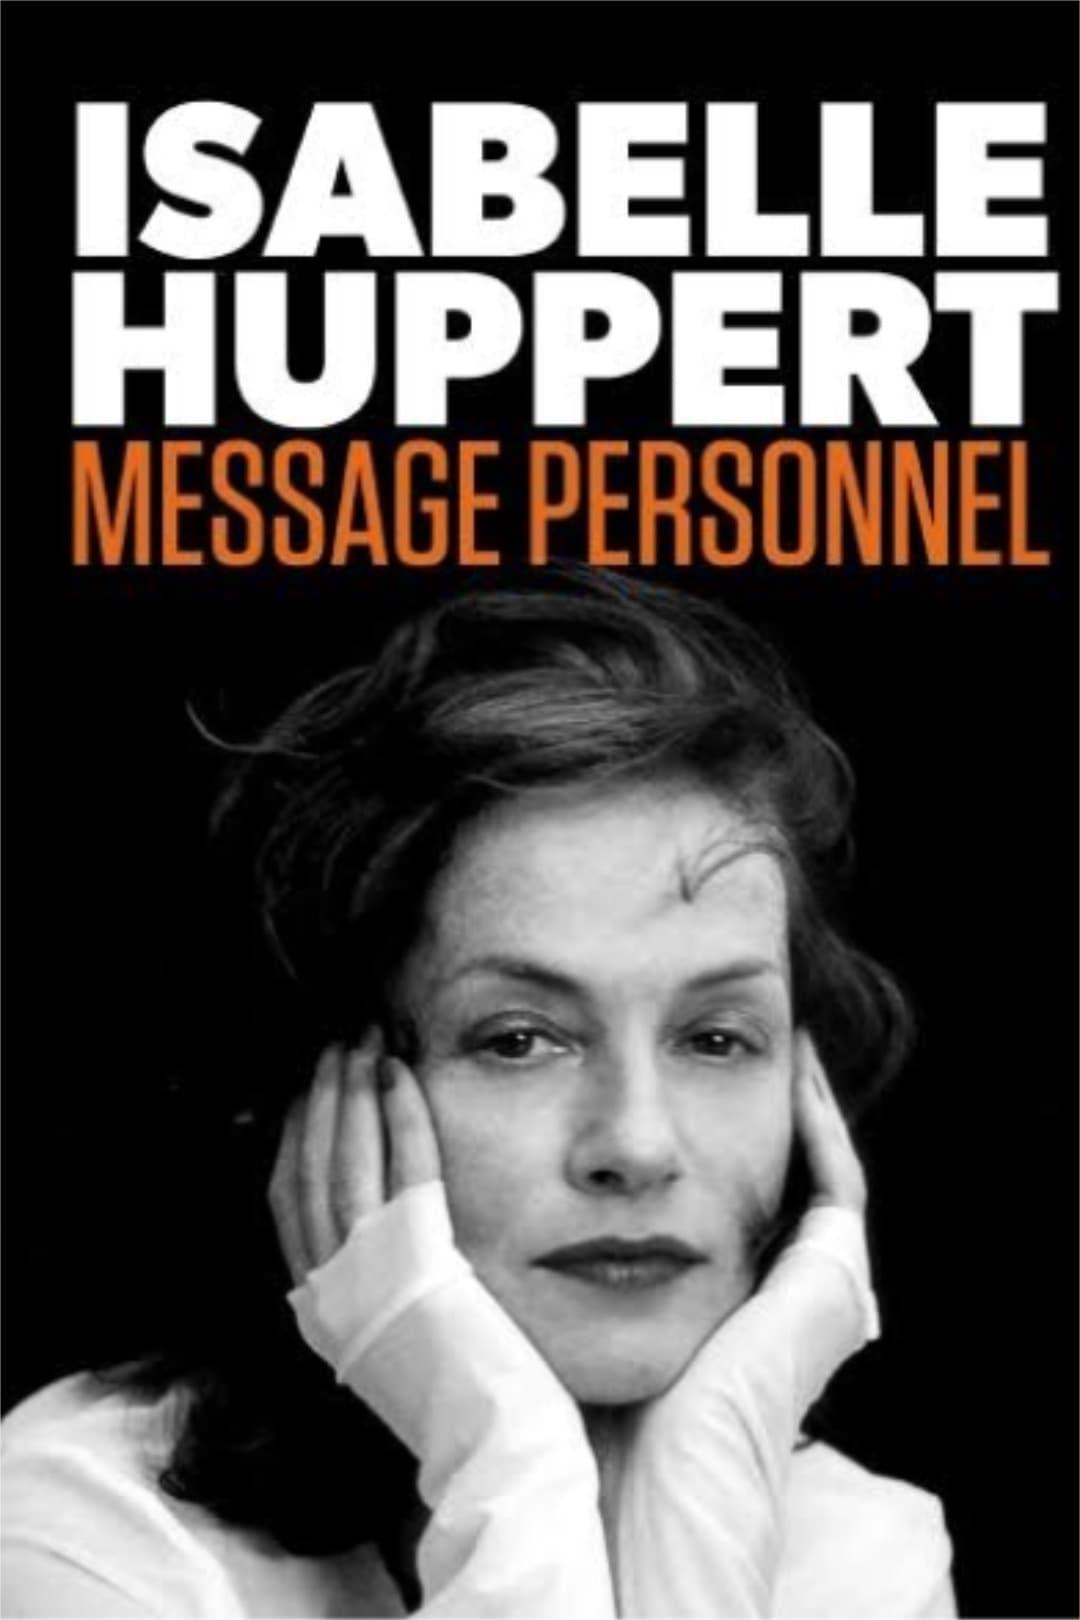 Isabelle Huppert, Mensagem Pessoal